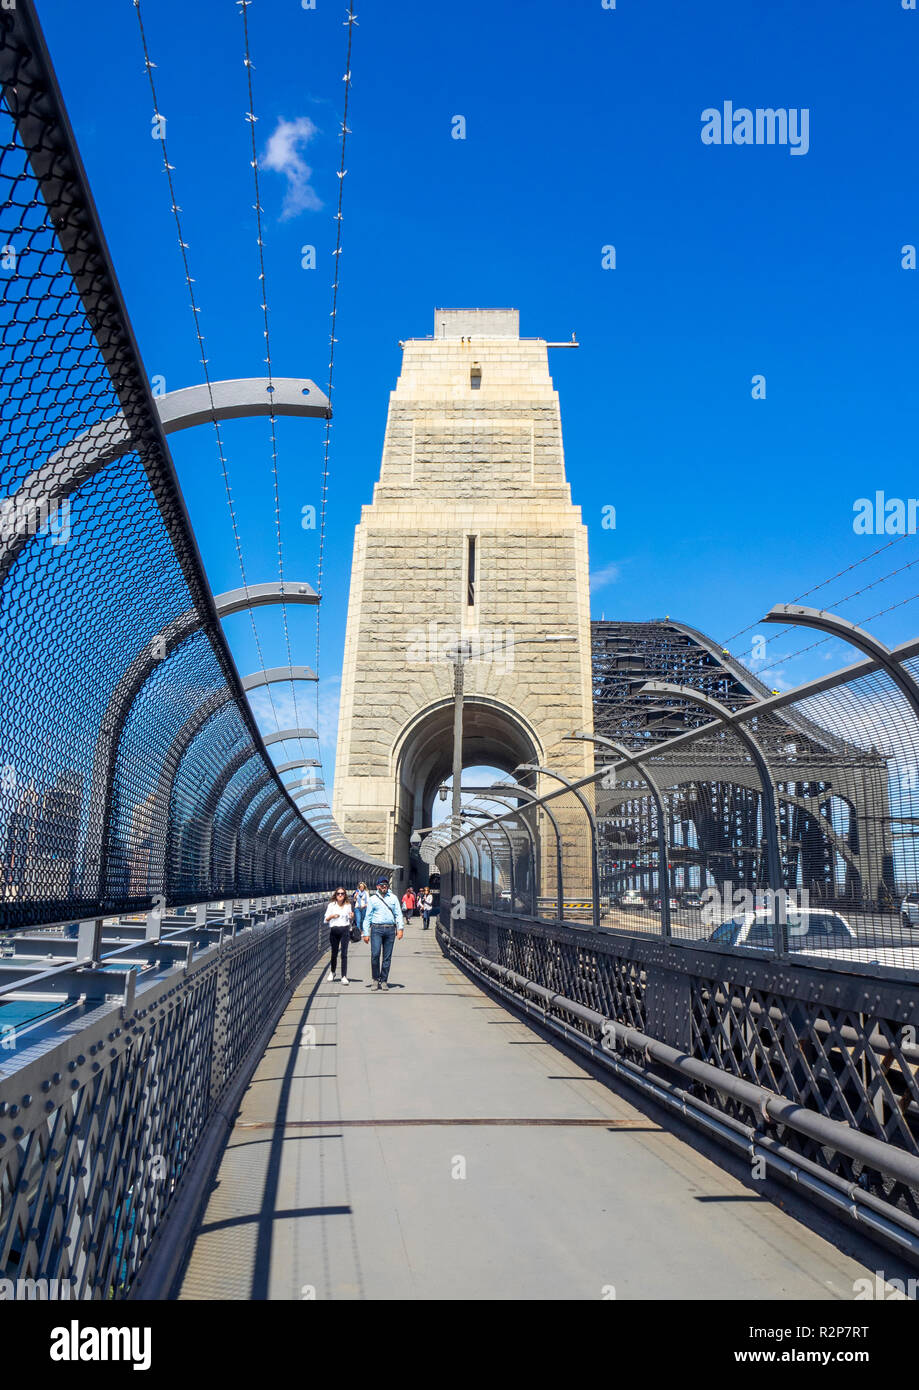 Pedestrians walking on pathway on the Sydney Harbour Bridge Sydney NSW Australia. - Stock Image